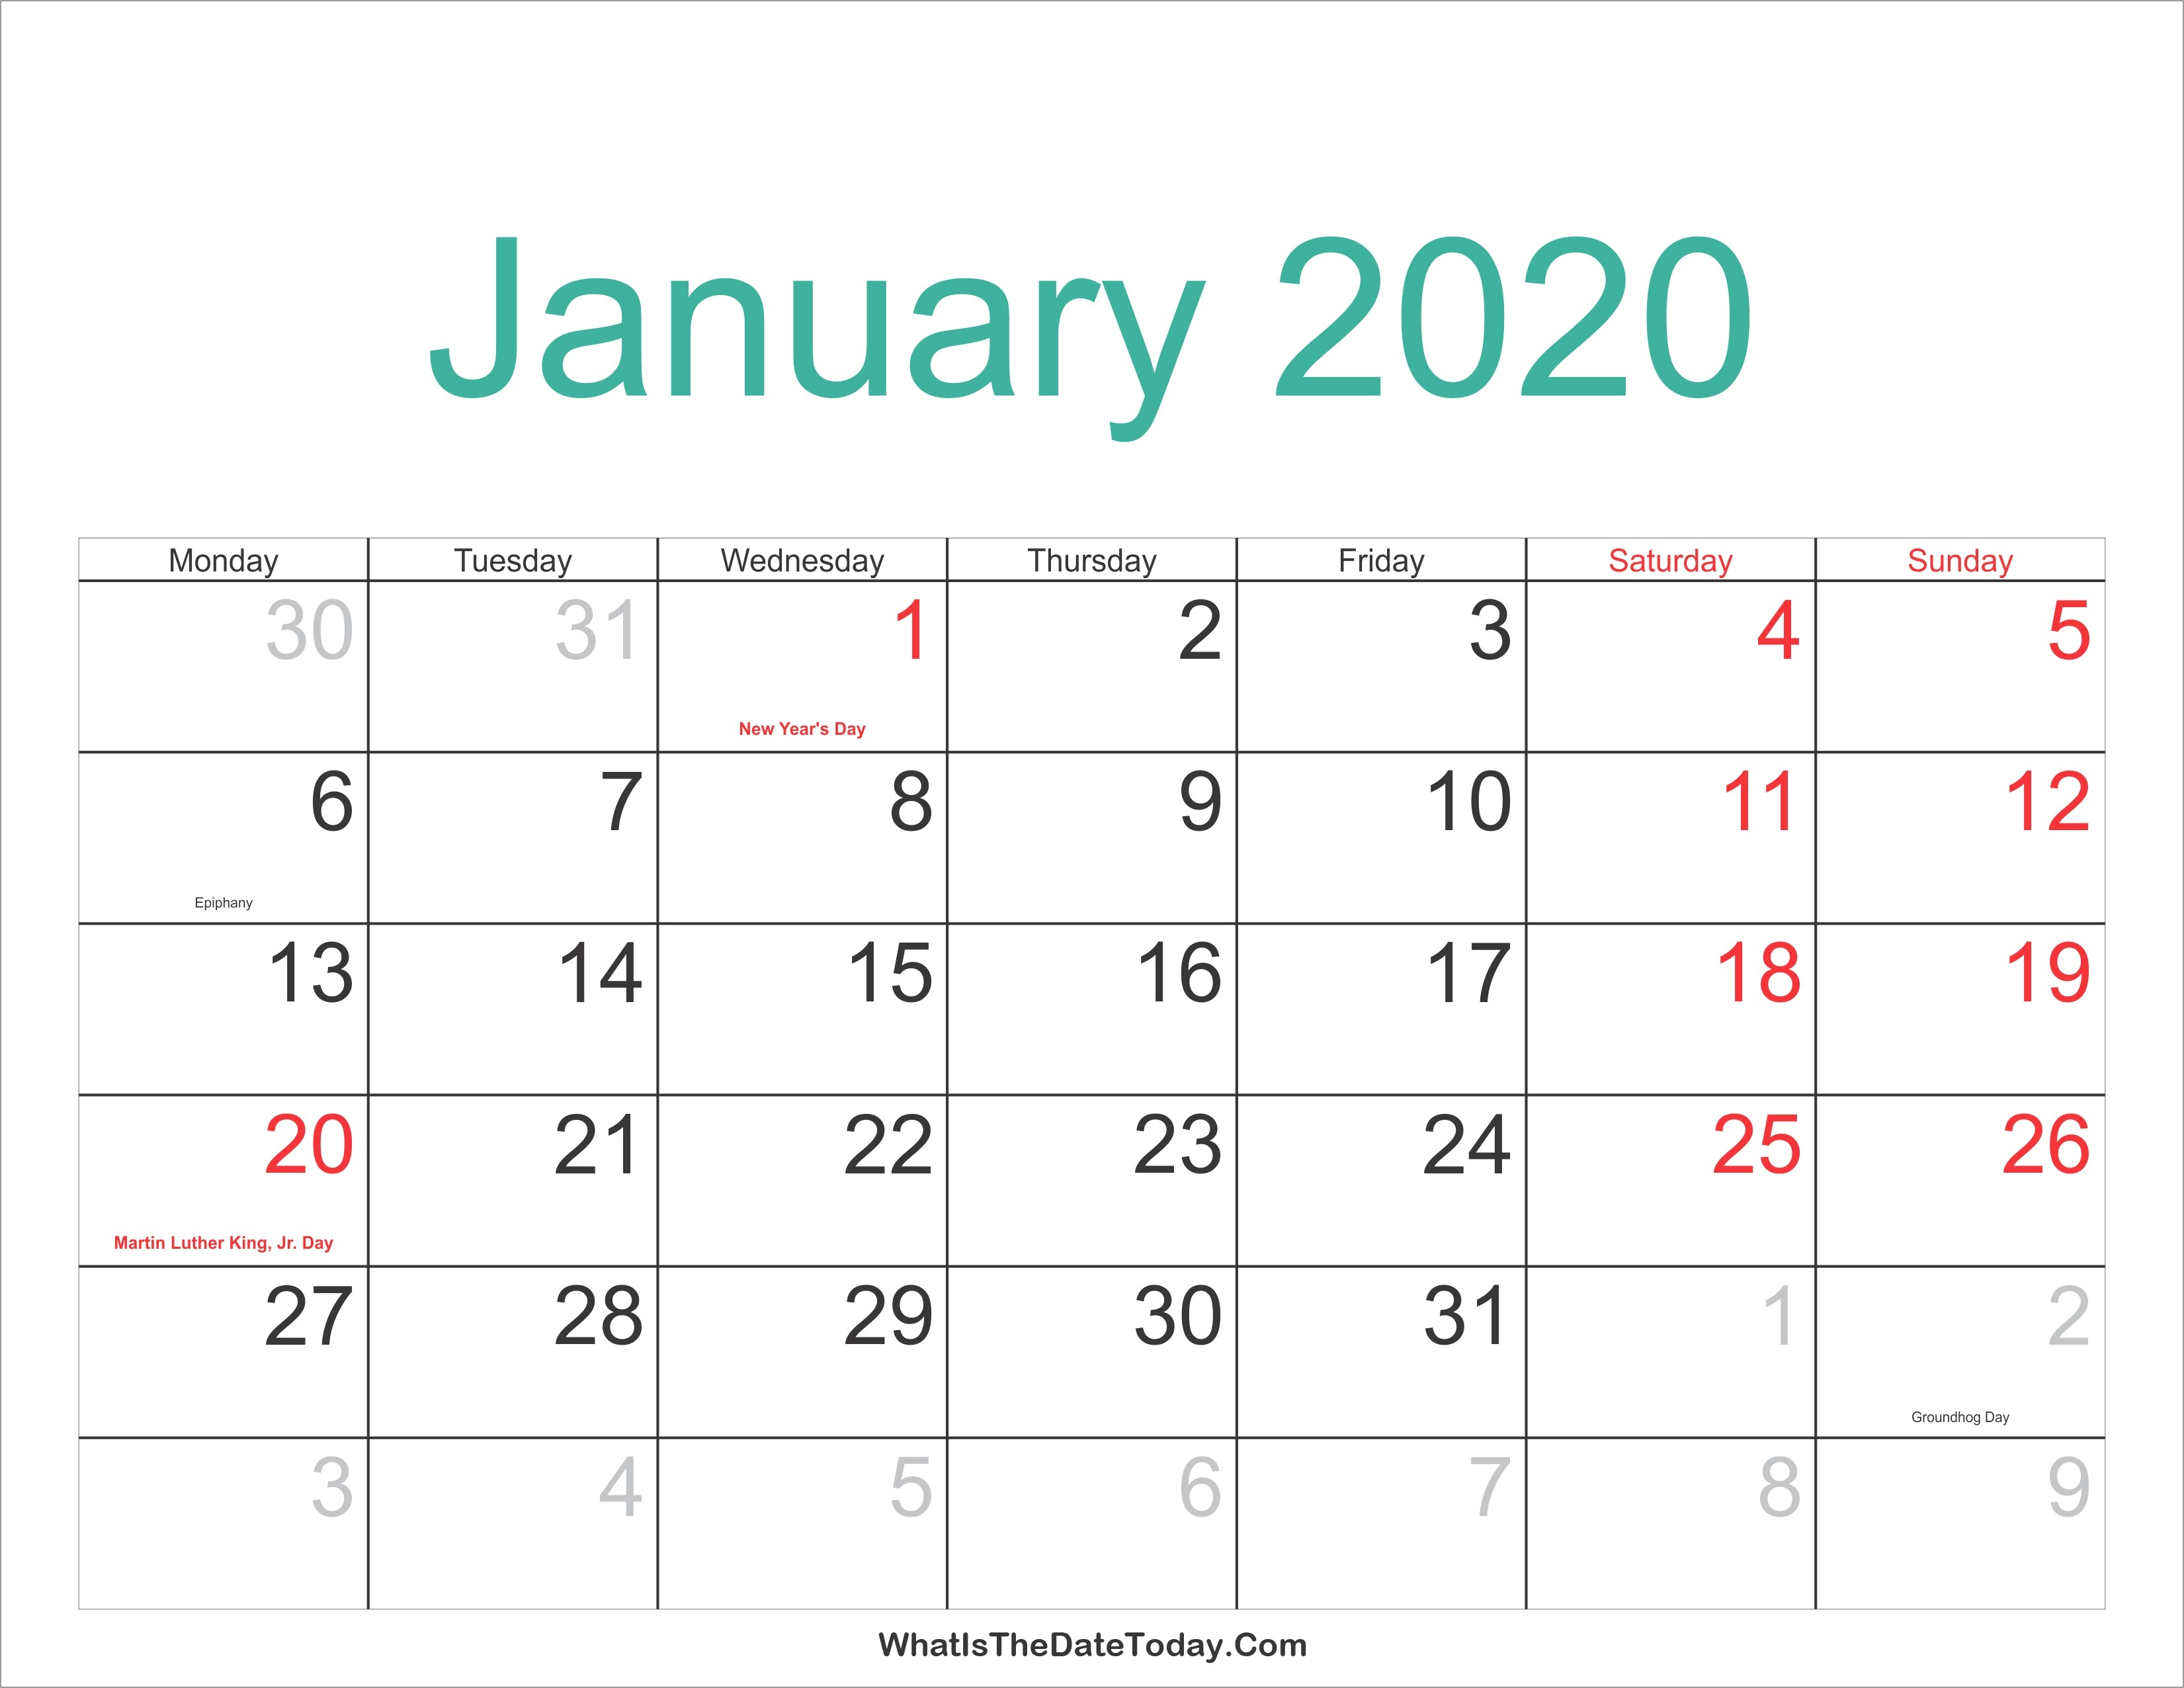 January 2020 Calendar Printable Holidays Full | Jcreview-Lunar Calendar January 2020